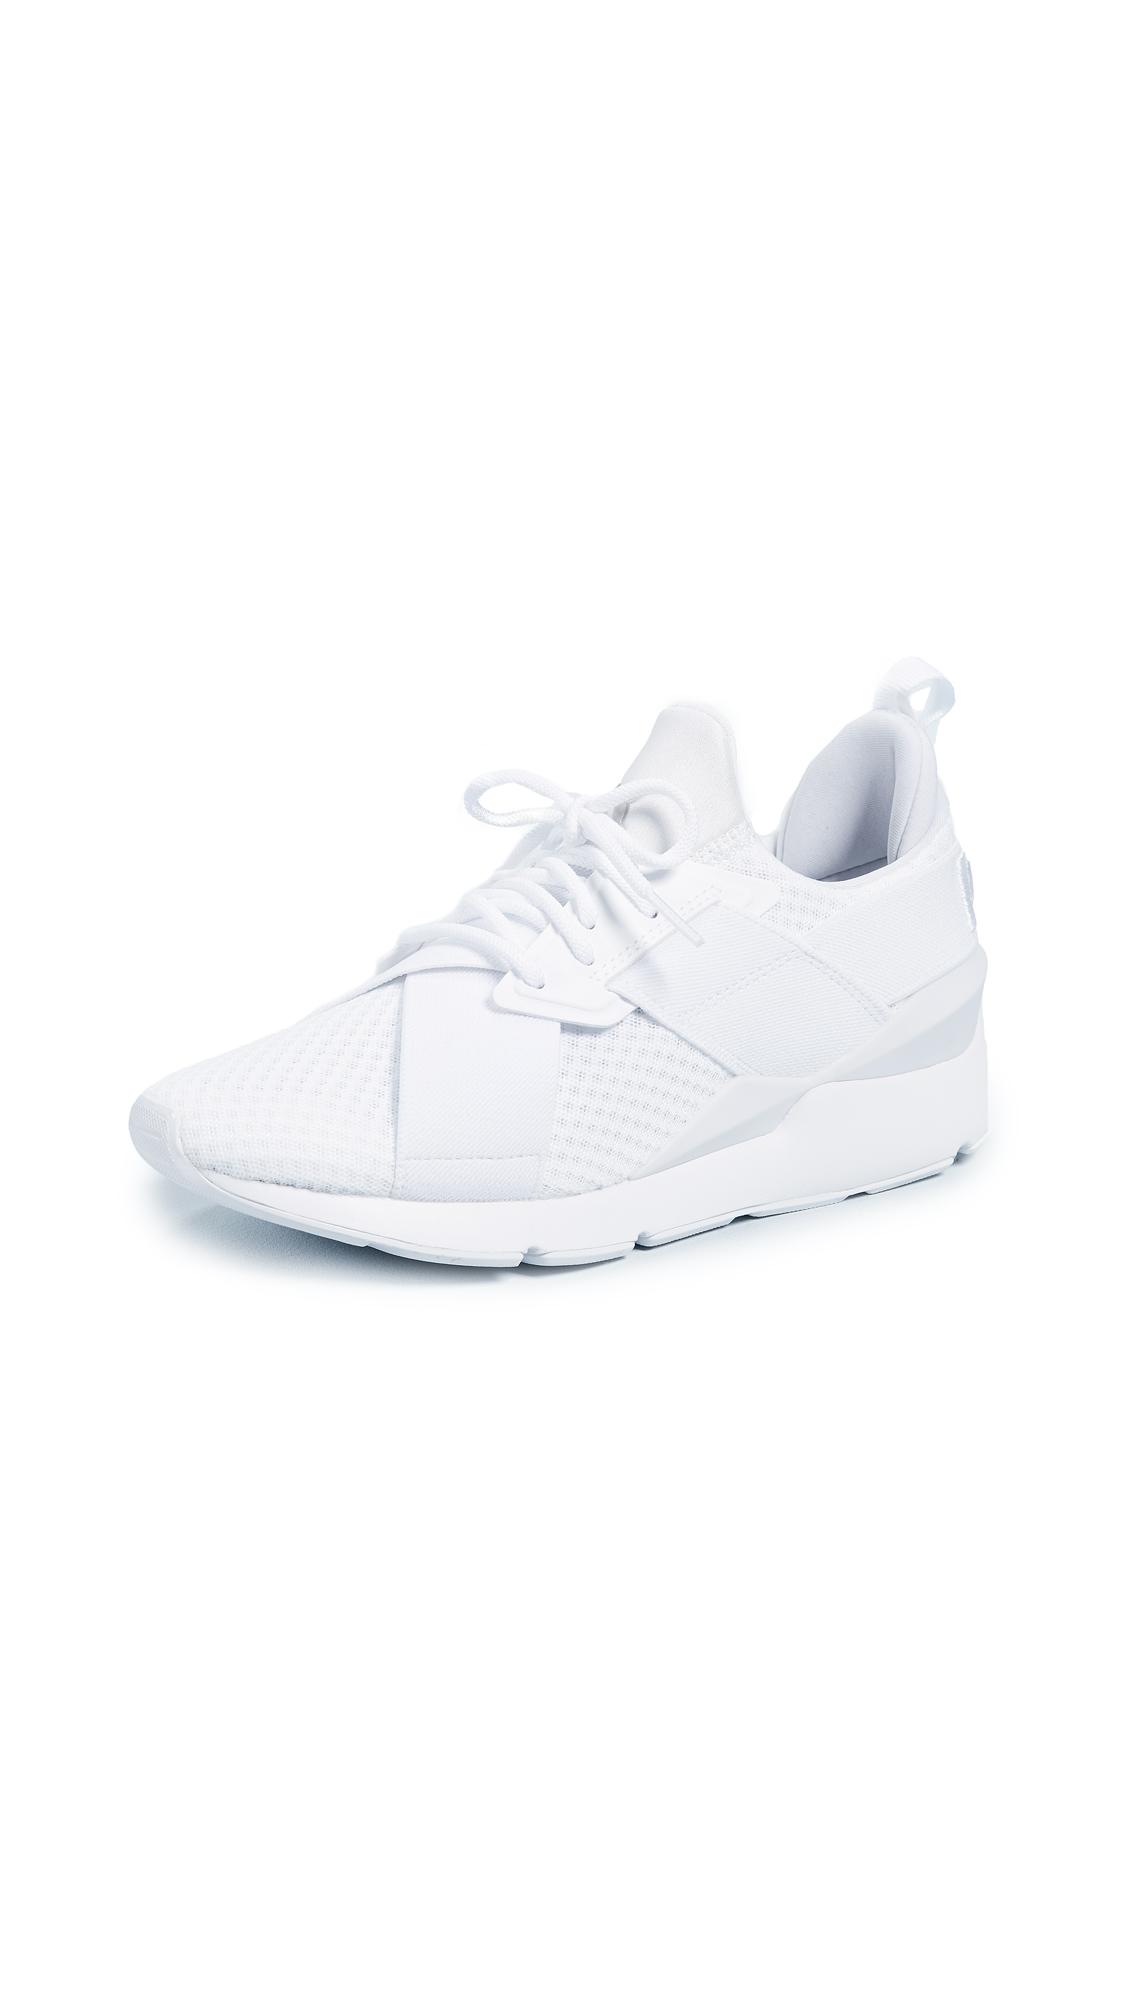 Women'S Muse Ep Slip-On Sneakers, Puma White/Puma White